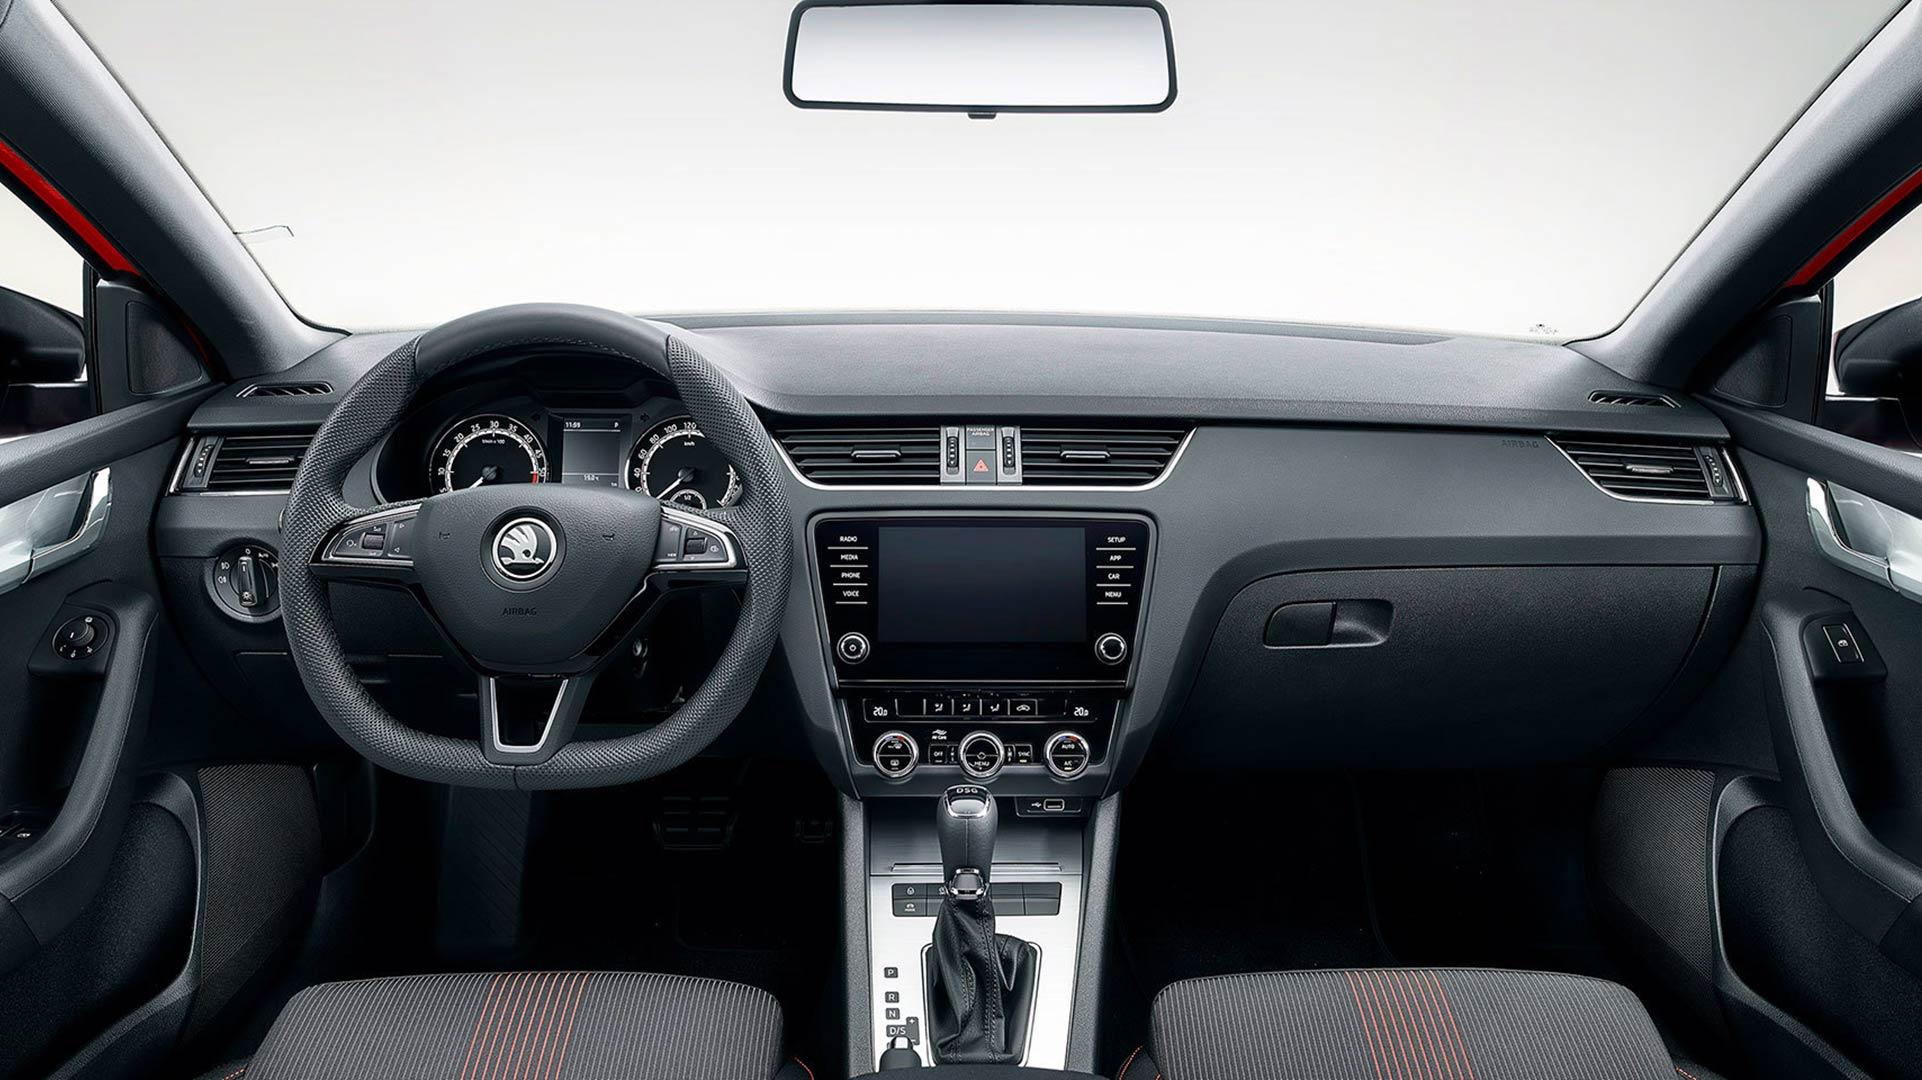 C:\Users\Jialing\Desktop\20190410\640-Car Guide\Octavia Sportline-half\2019-Skoda-Octavia-SportLine-UK-003.jpg